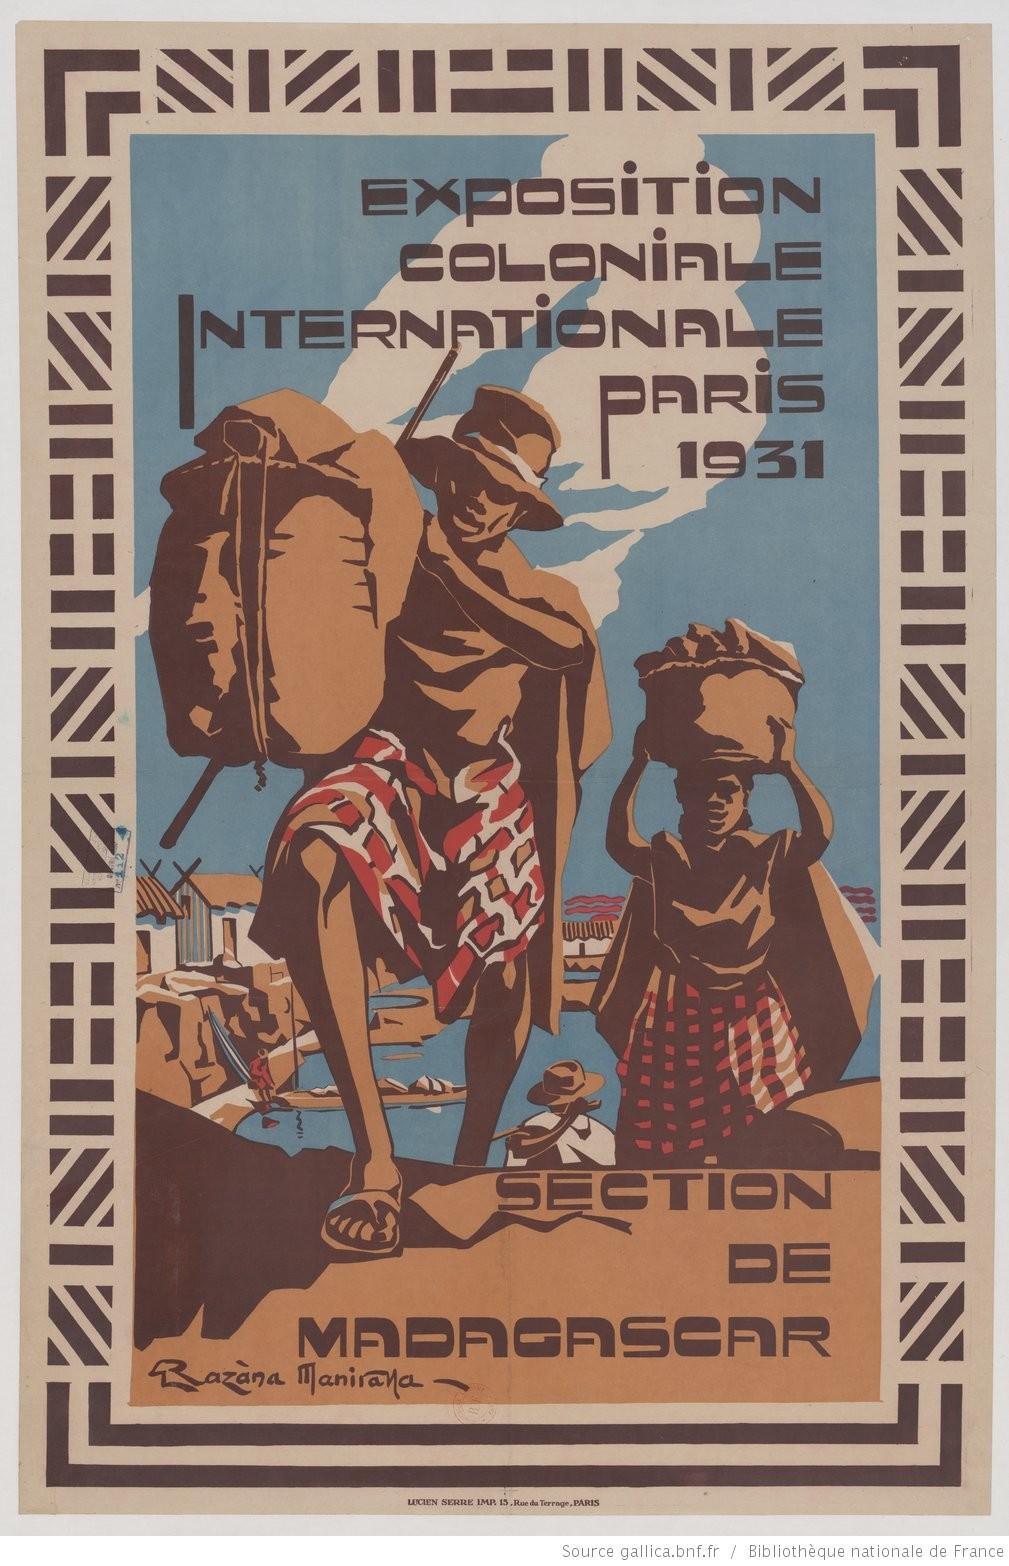 https://www.retronews.fr/sites/default/files/styles/rn_large/public/file_covers/exposition_coloniale_internationale_paris_1931_._btv1b530745767.jpeg?itok=9VSmfeoW